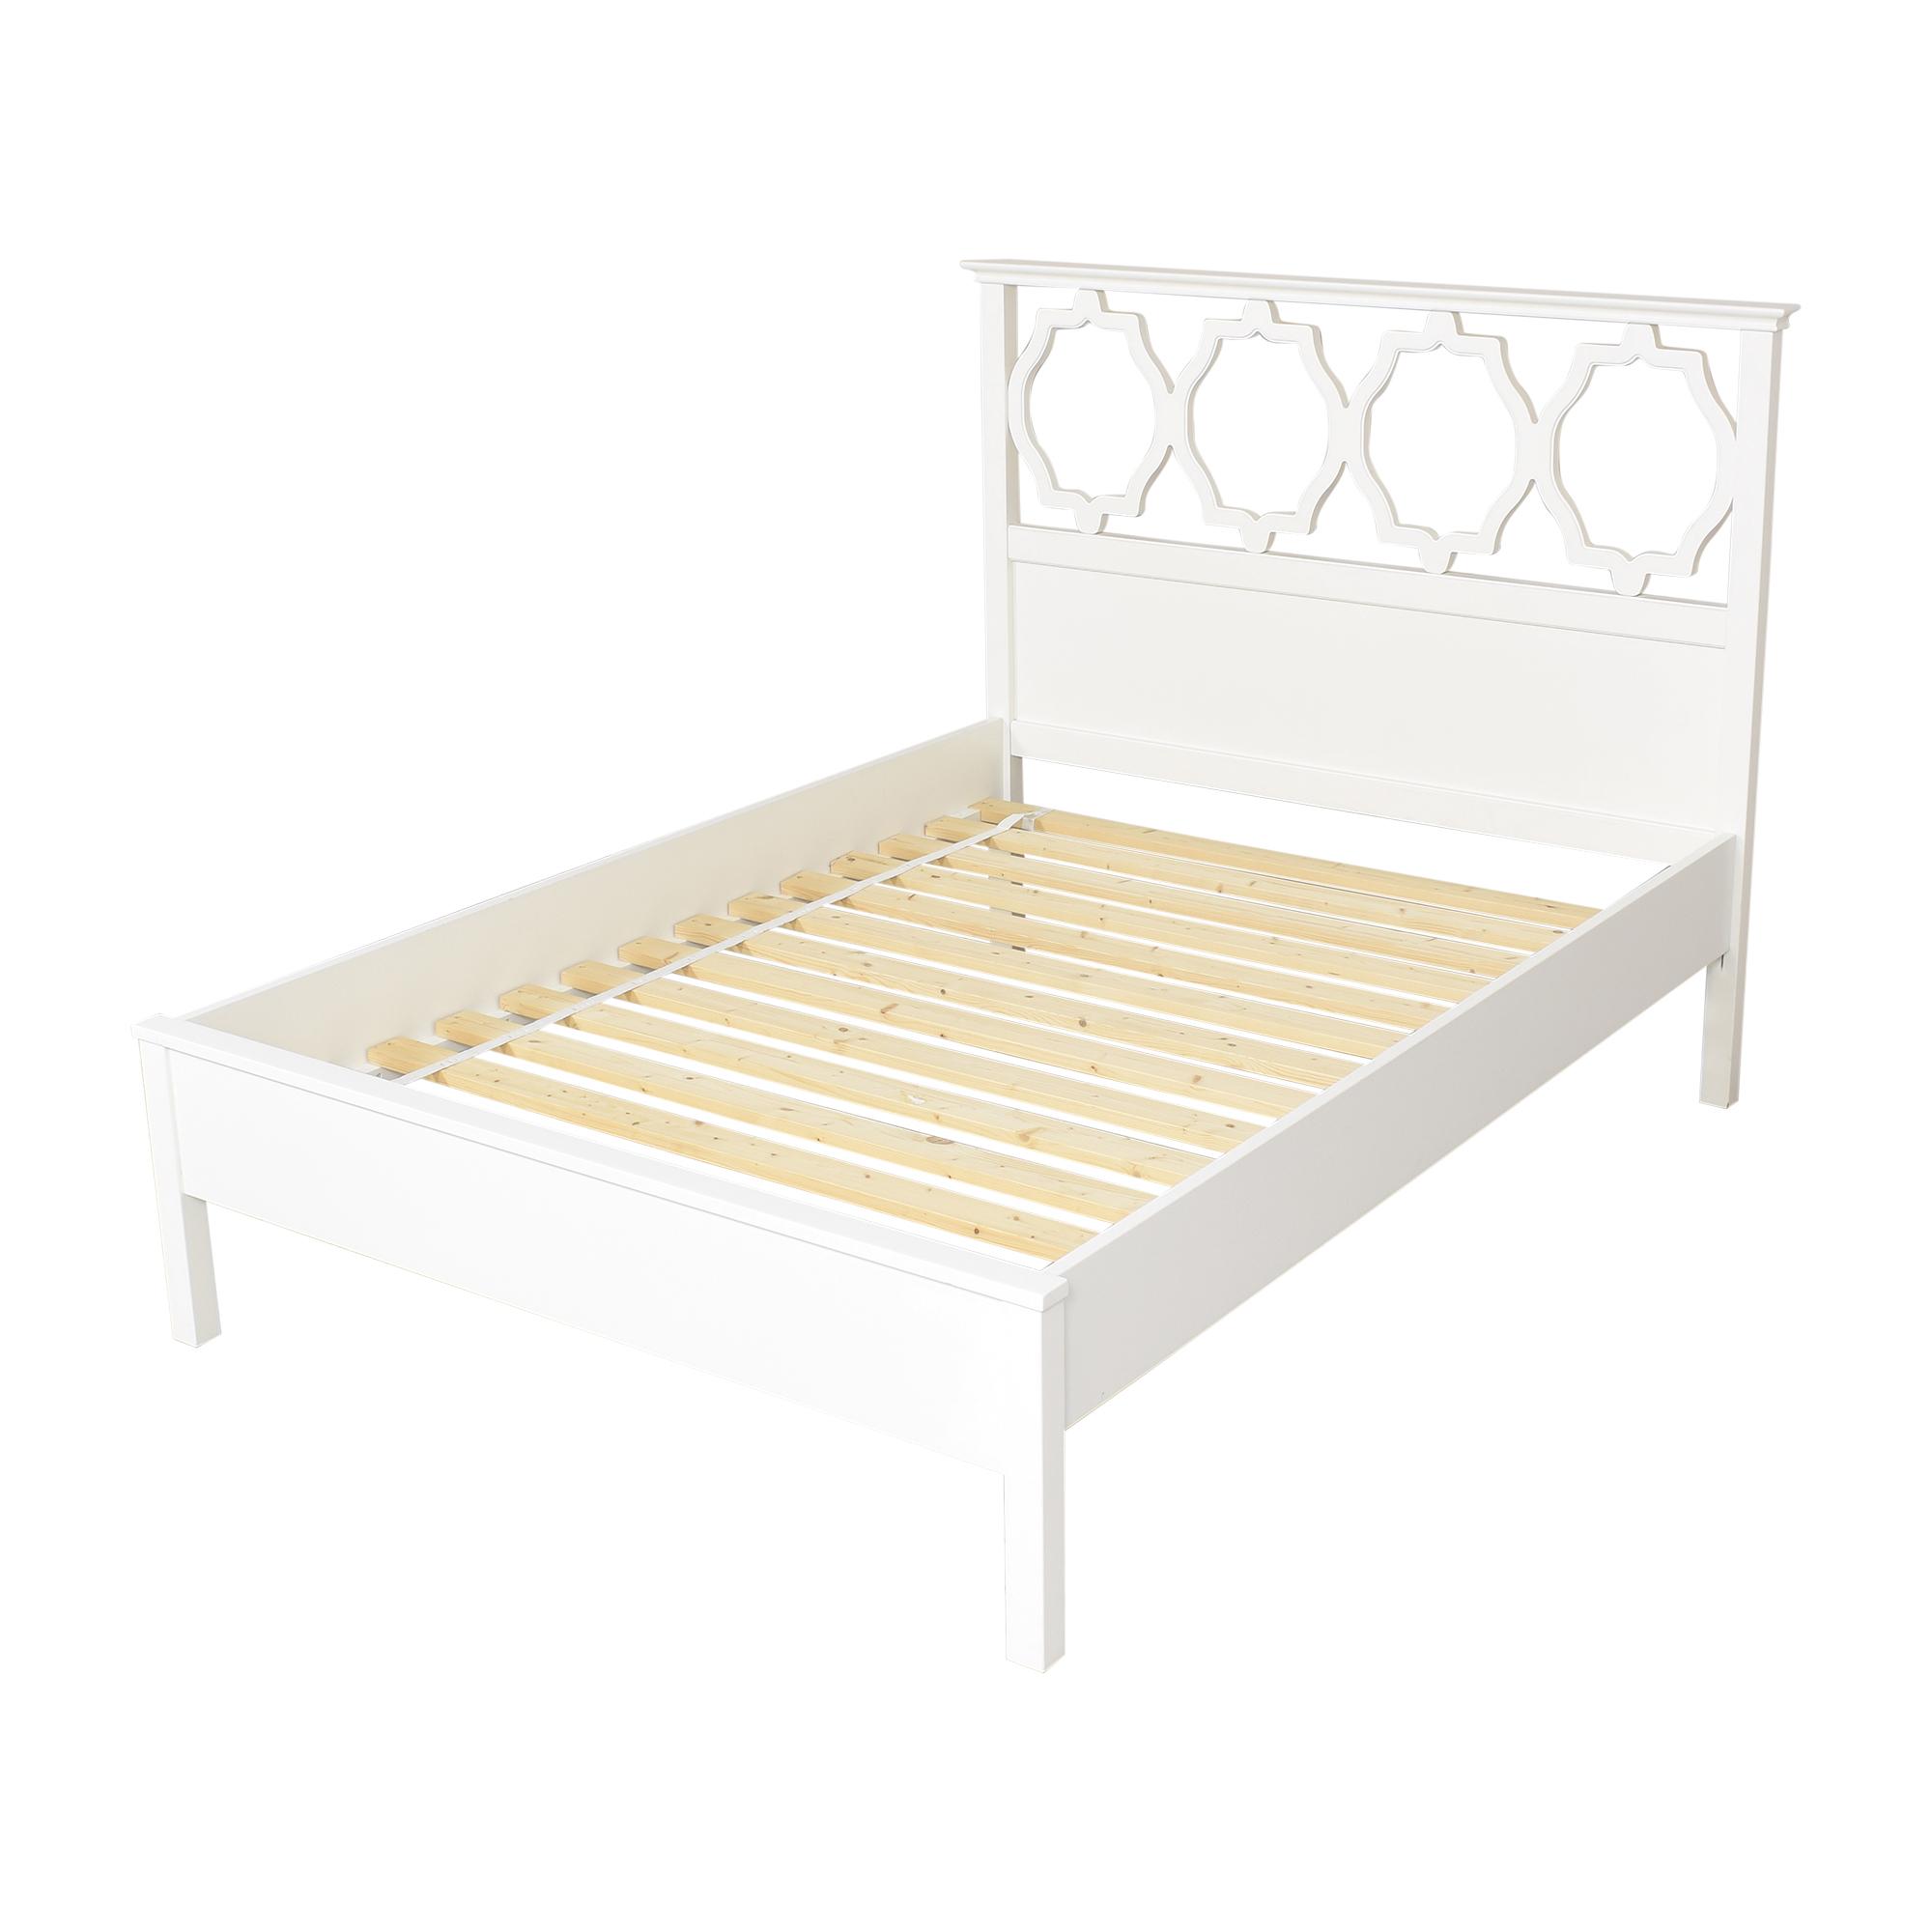 PBteen PBteen Elsie Full Bed Beds